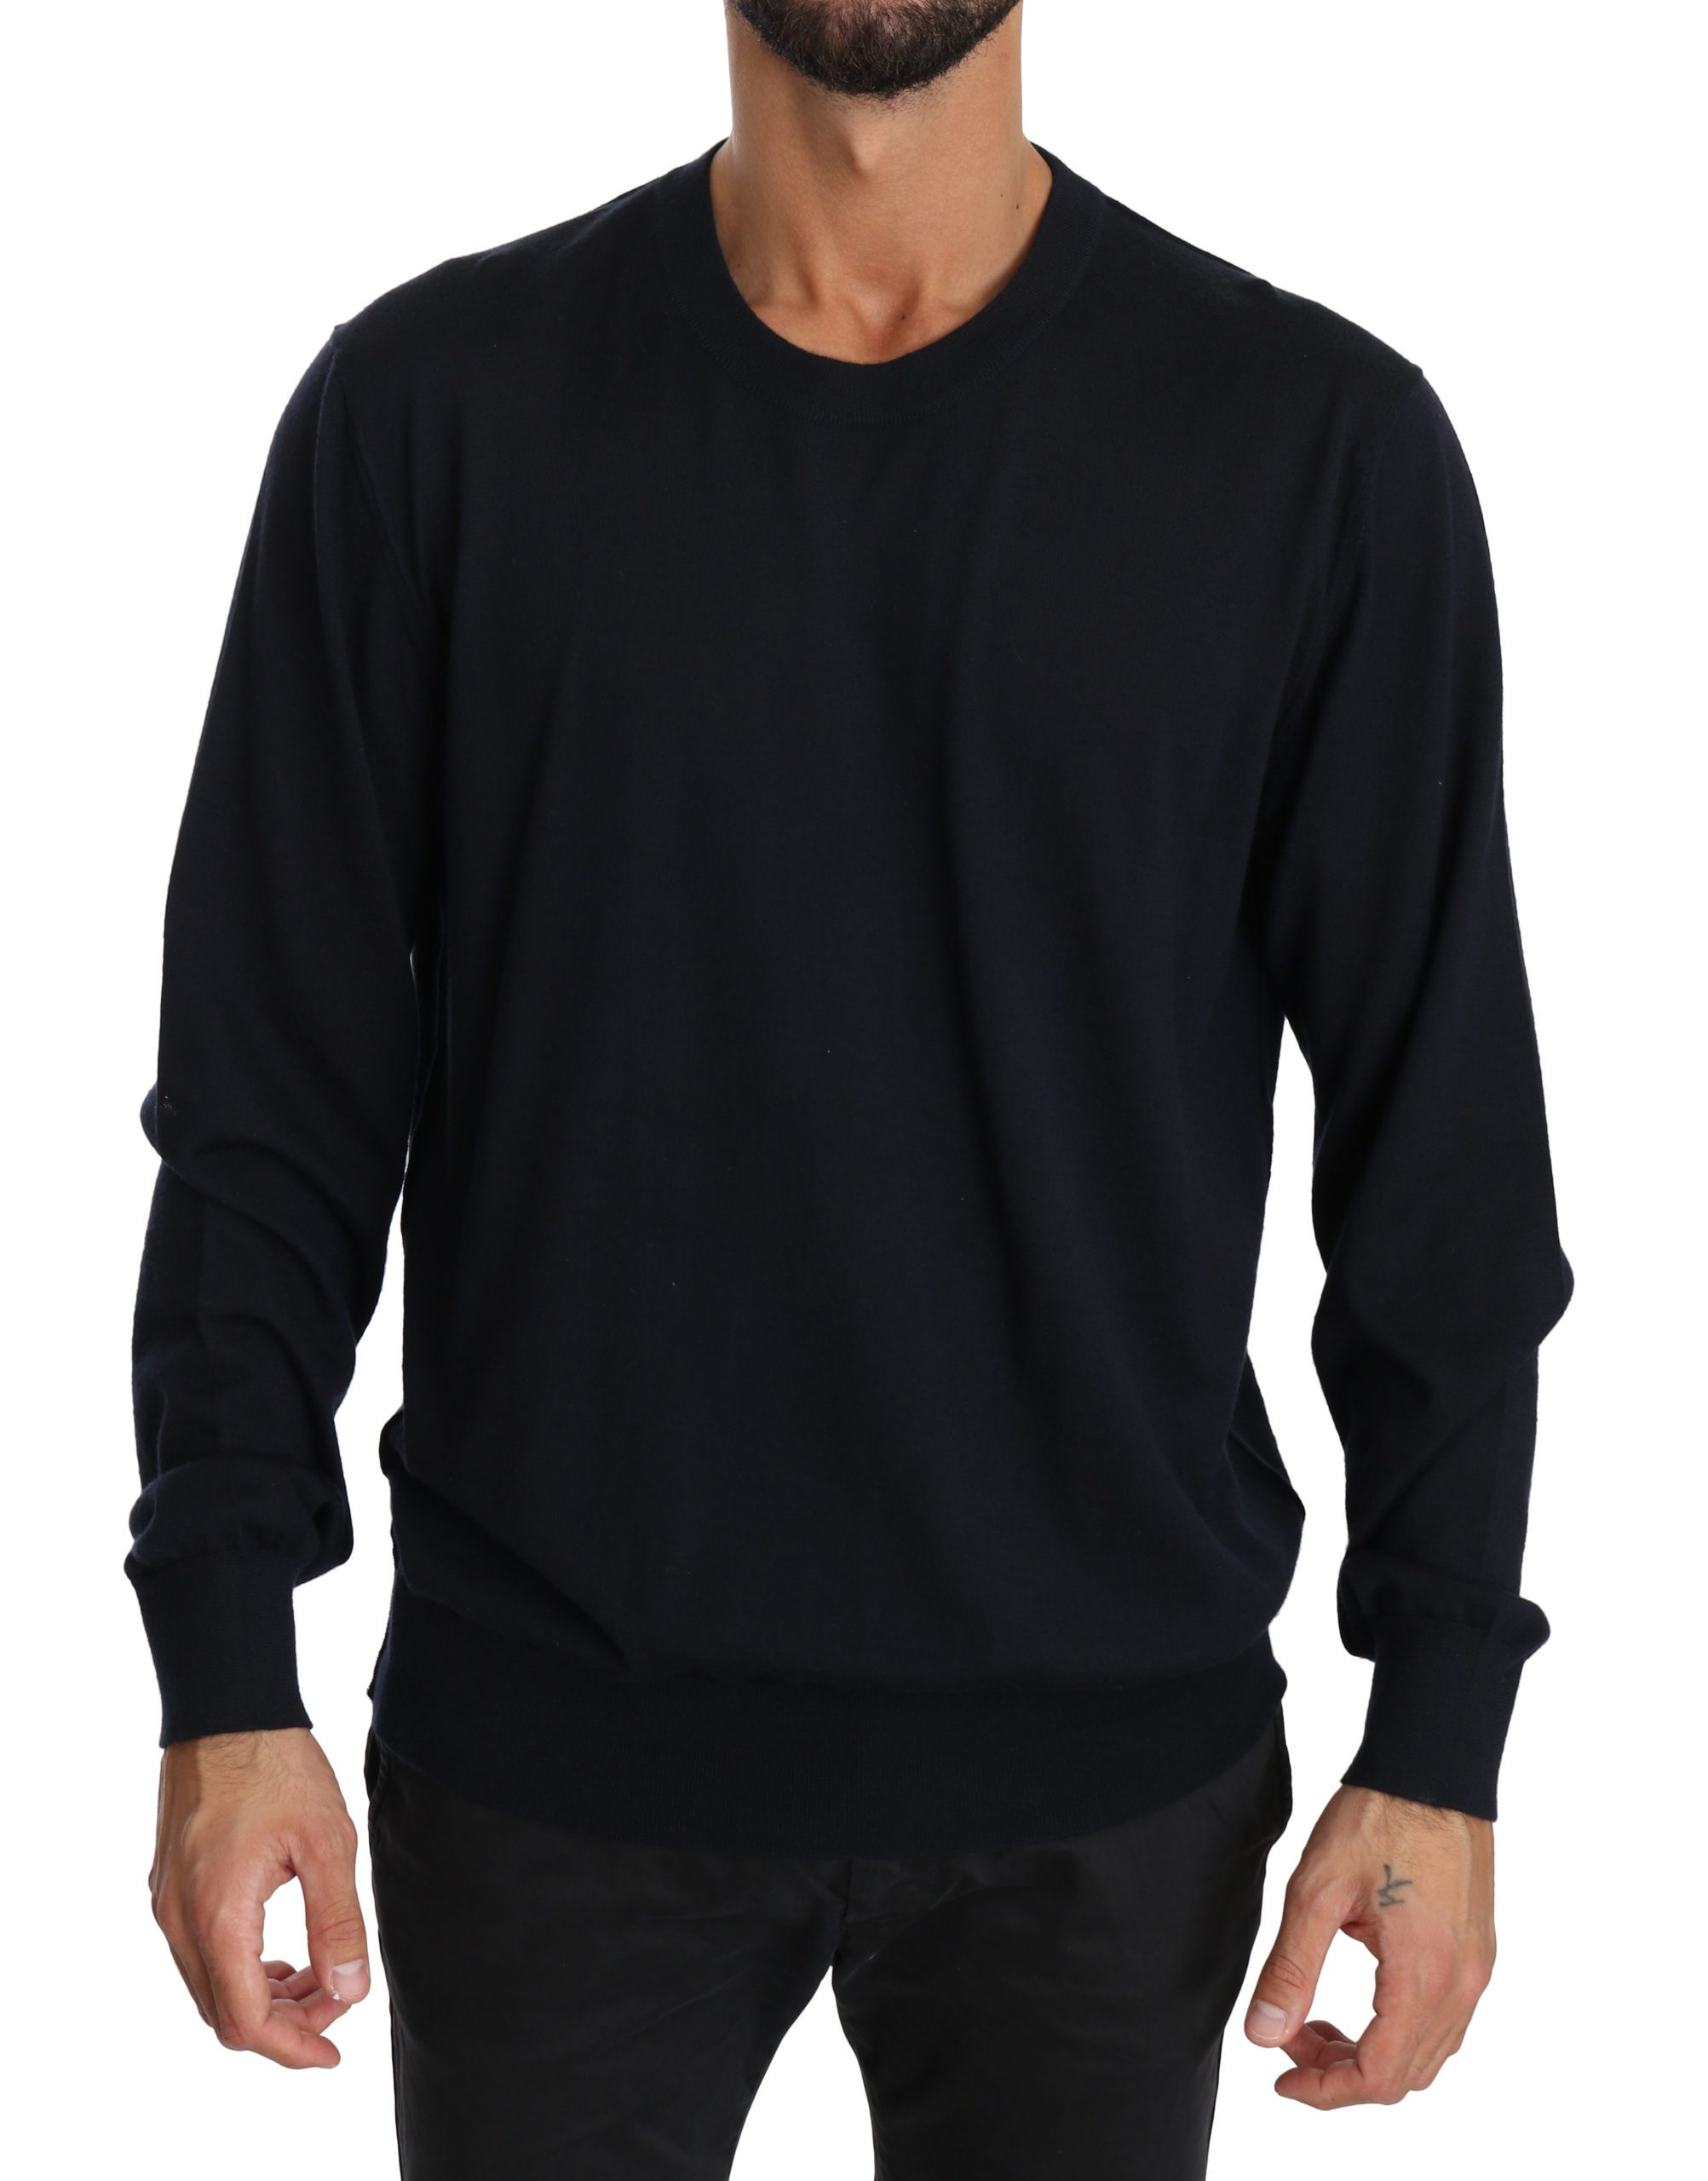 Dolce & Gabbana Men's Cashmere Crewneck Pullover Sweater Blue TSH3940 - IT52   XL